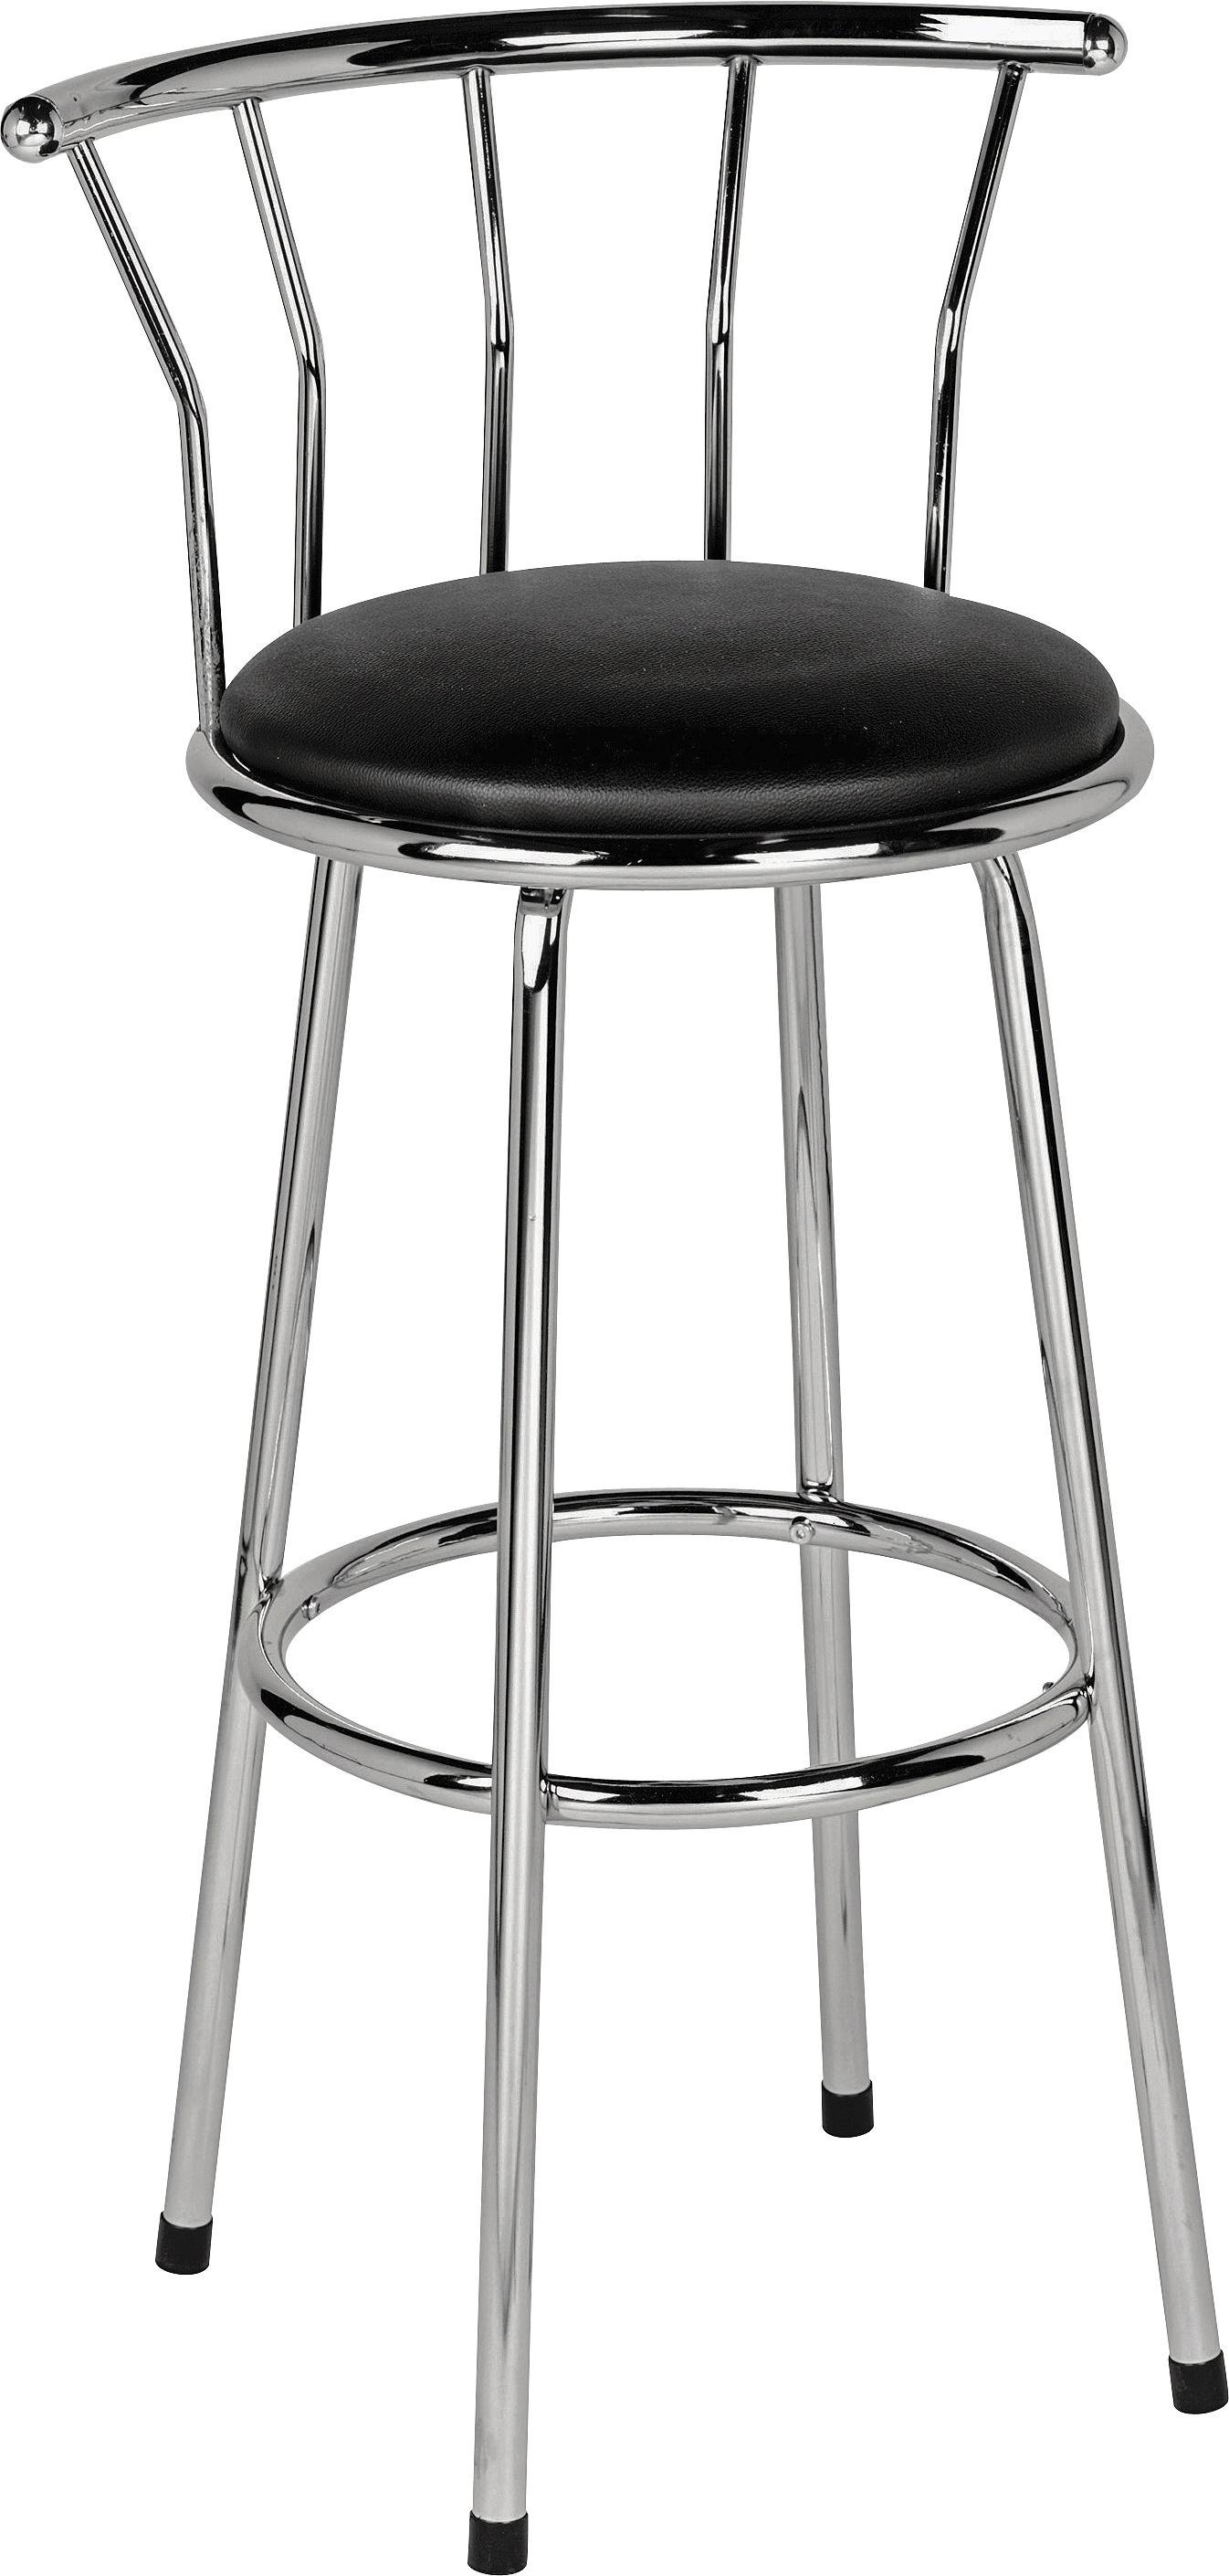 chair stool argos flexsteel sleeper buy home gemini leather effect bar black stools